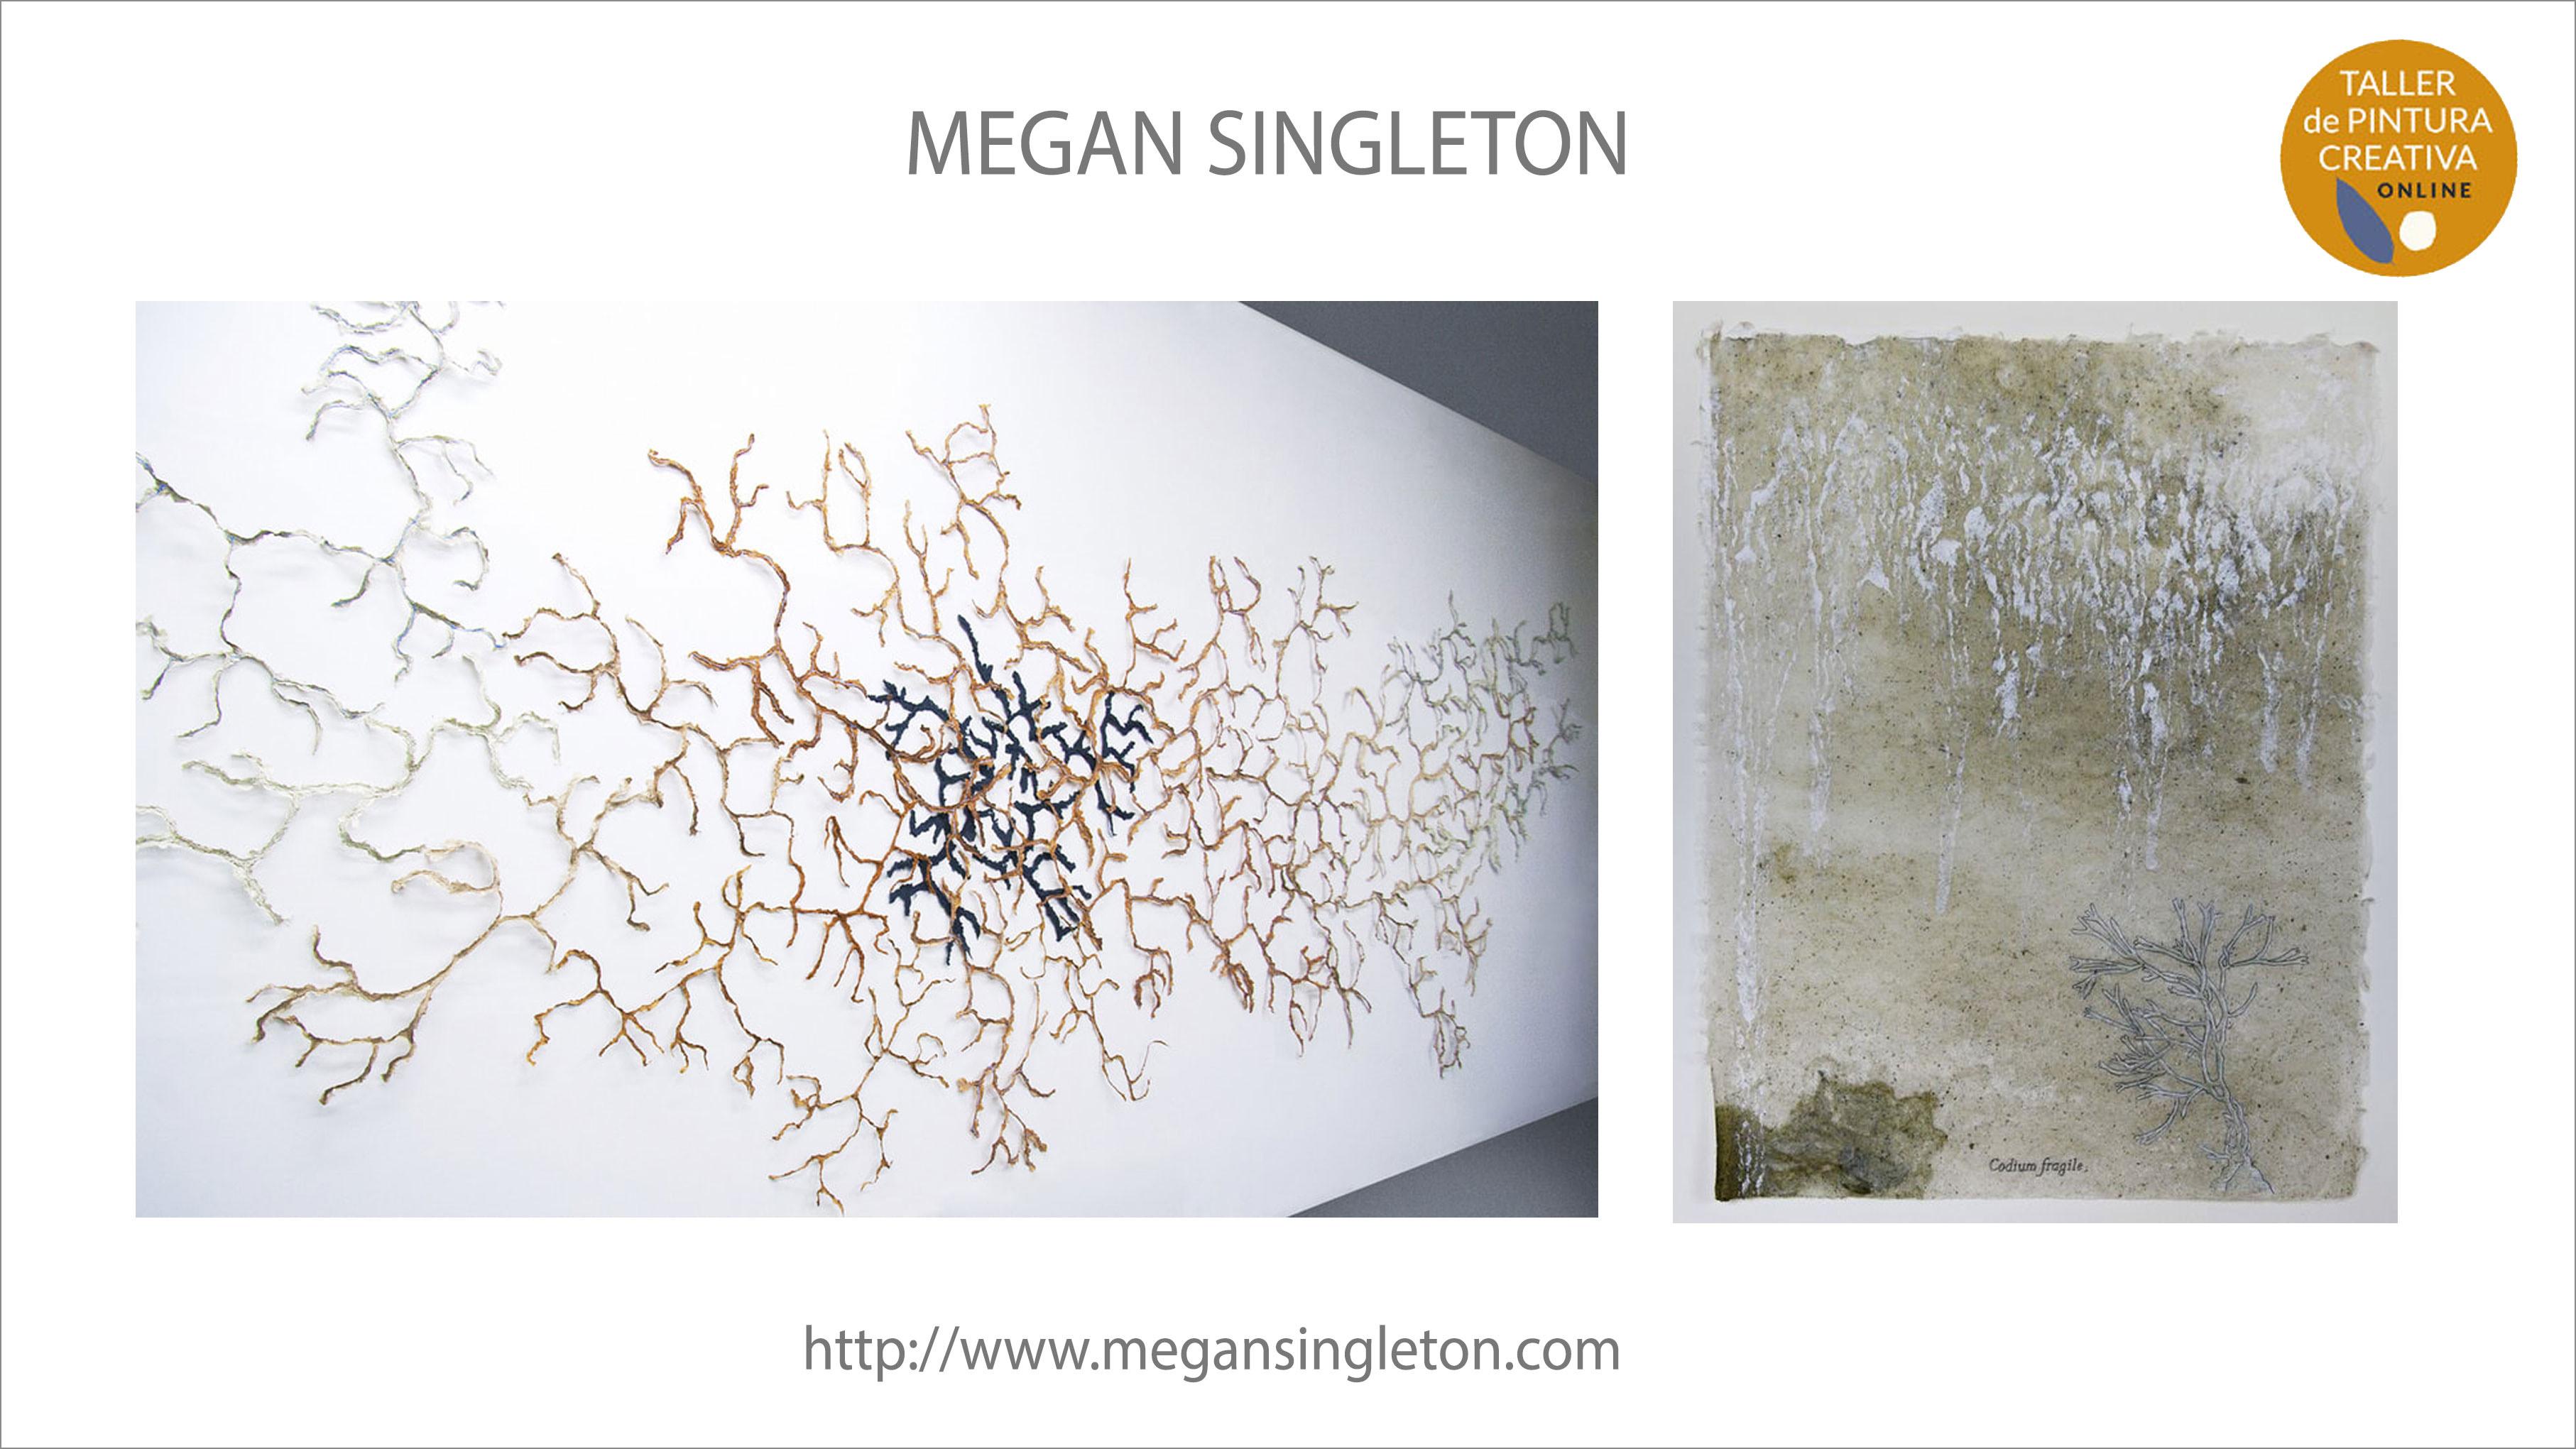 Megan Singleton